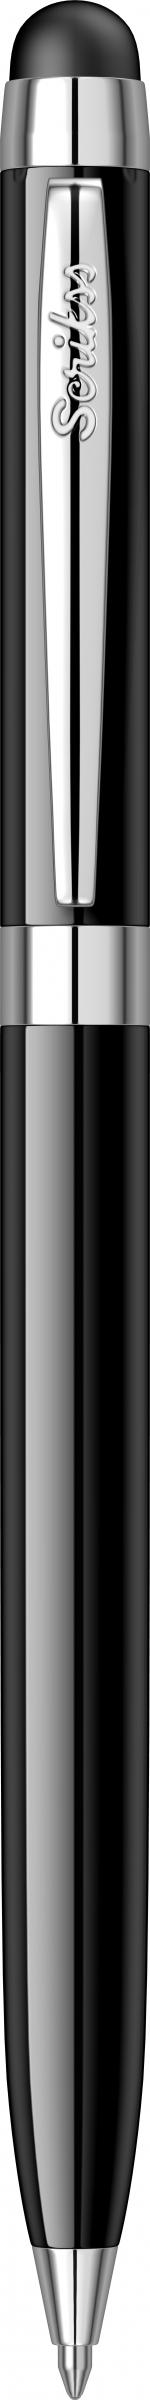 Black CT-1099